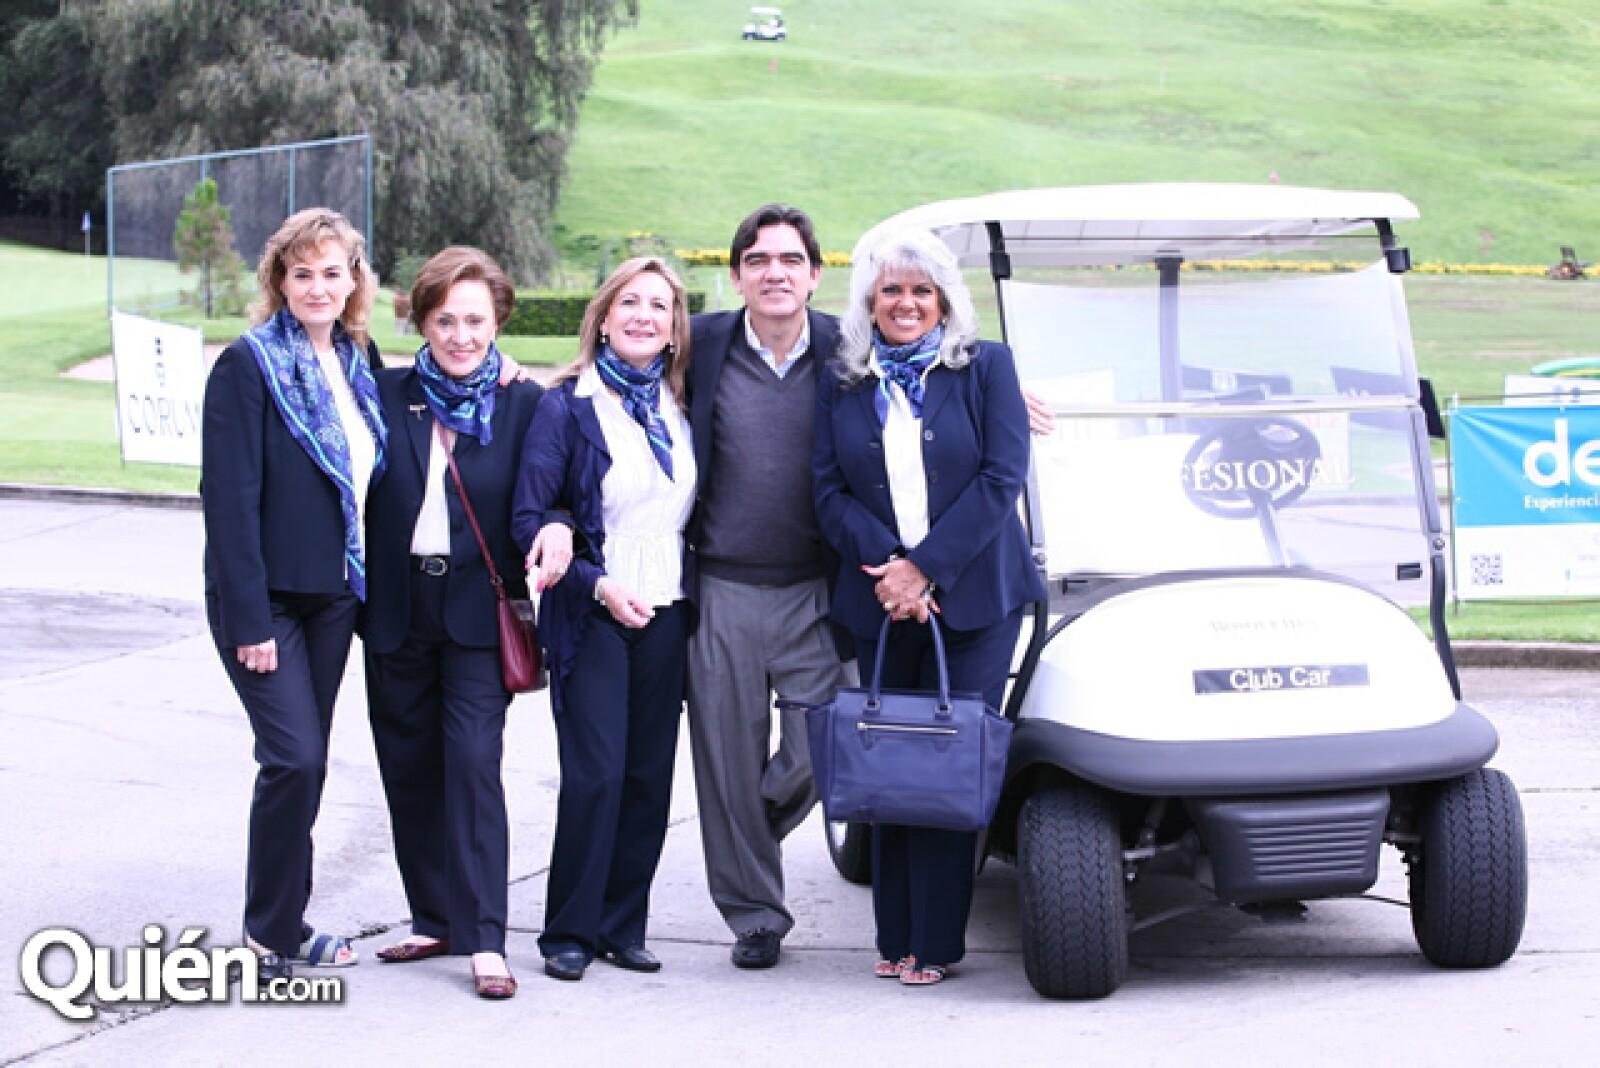 Maricarmen Cuetara,Eugenia Ahumada,Mally Jiménez O´farril,Jorge Ahumada,Sabrina Infante